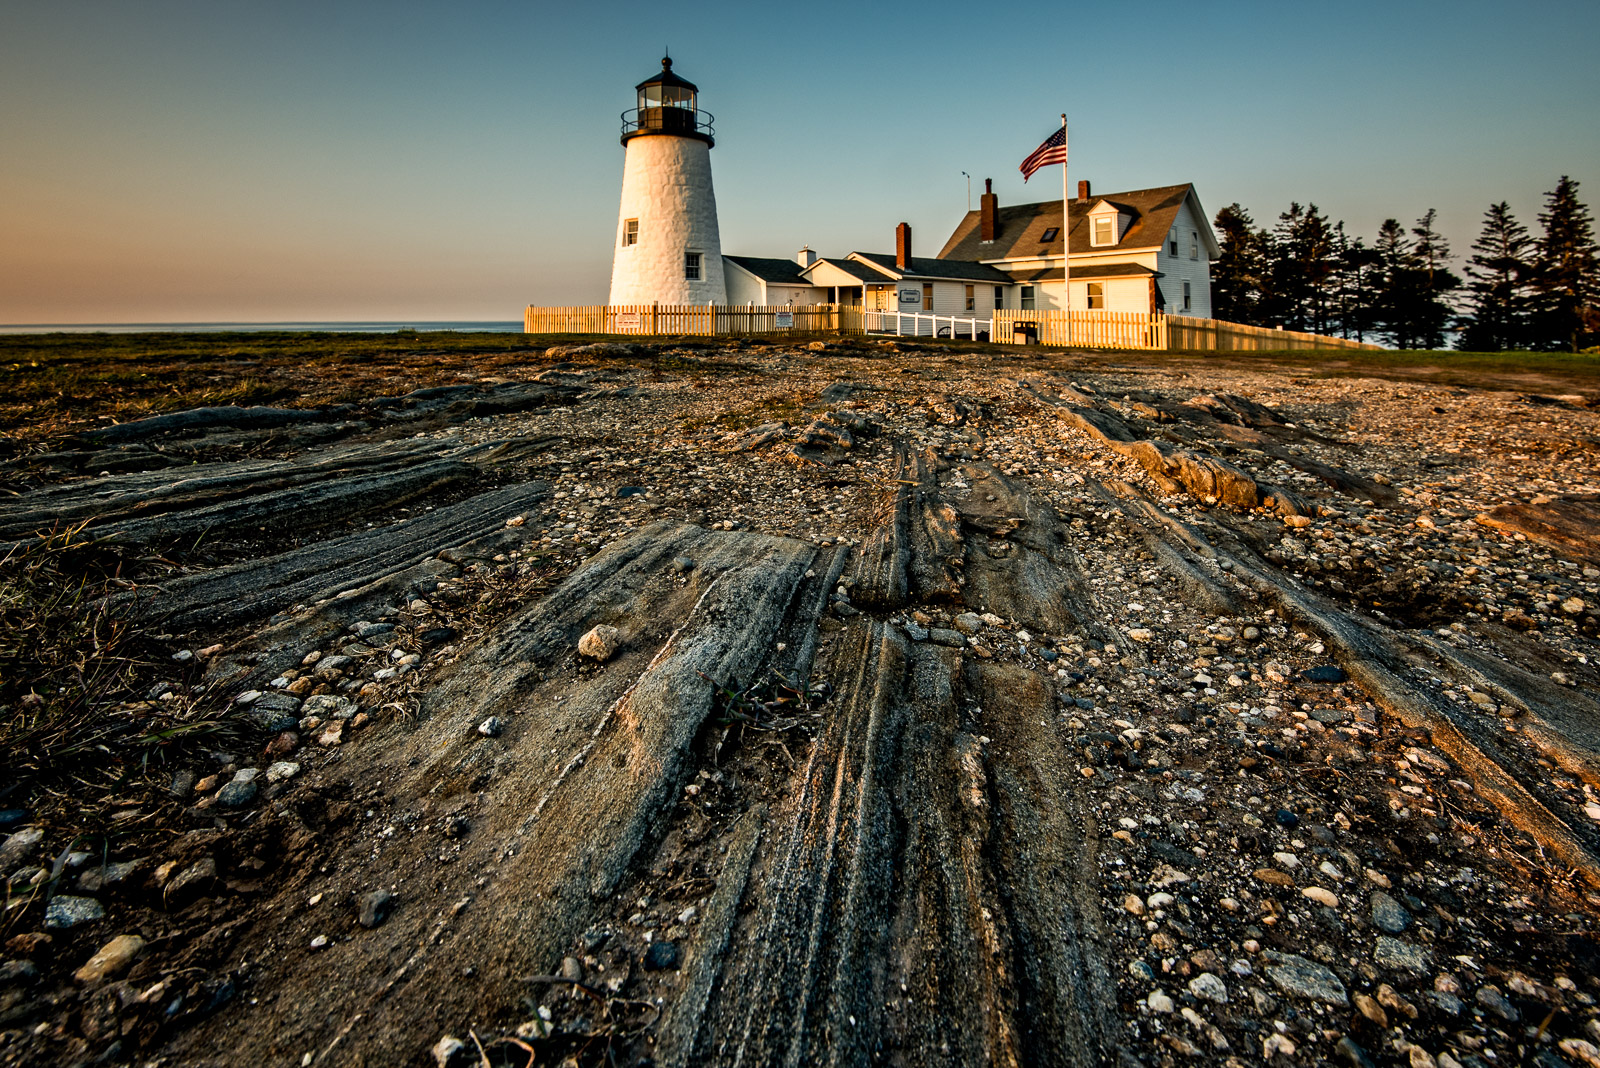 Maine, New England, Lighthouse, coast, early morning, wide angle, New England Photo Workshops